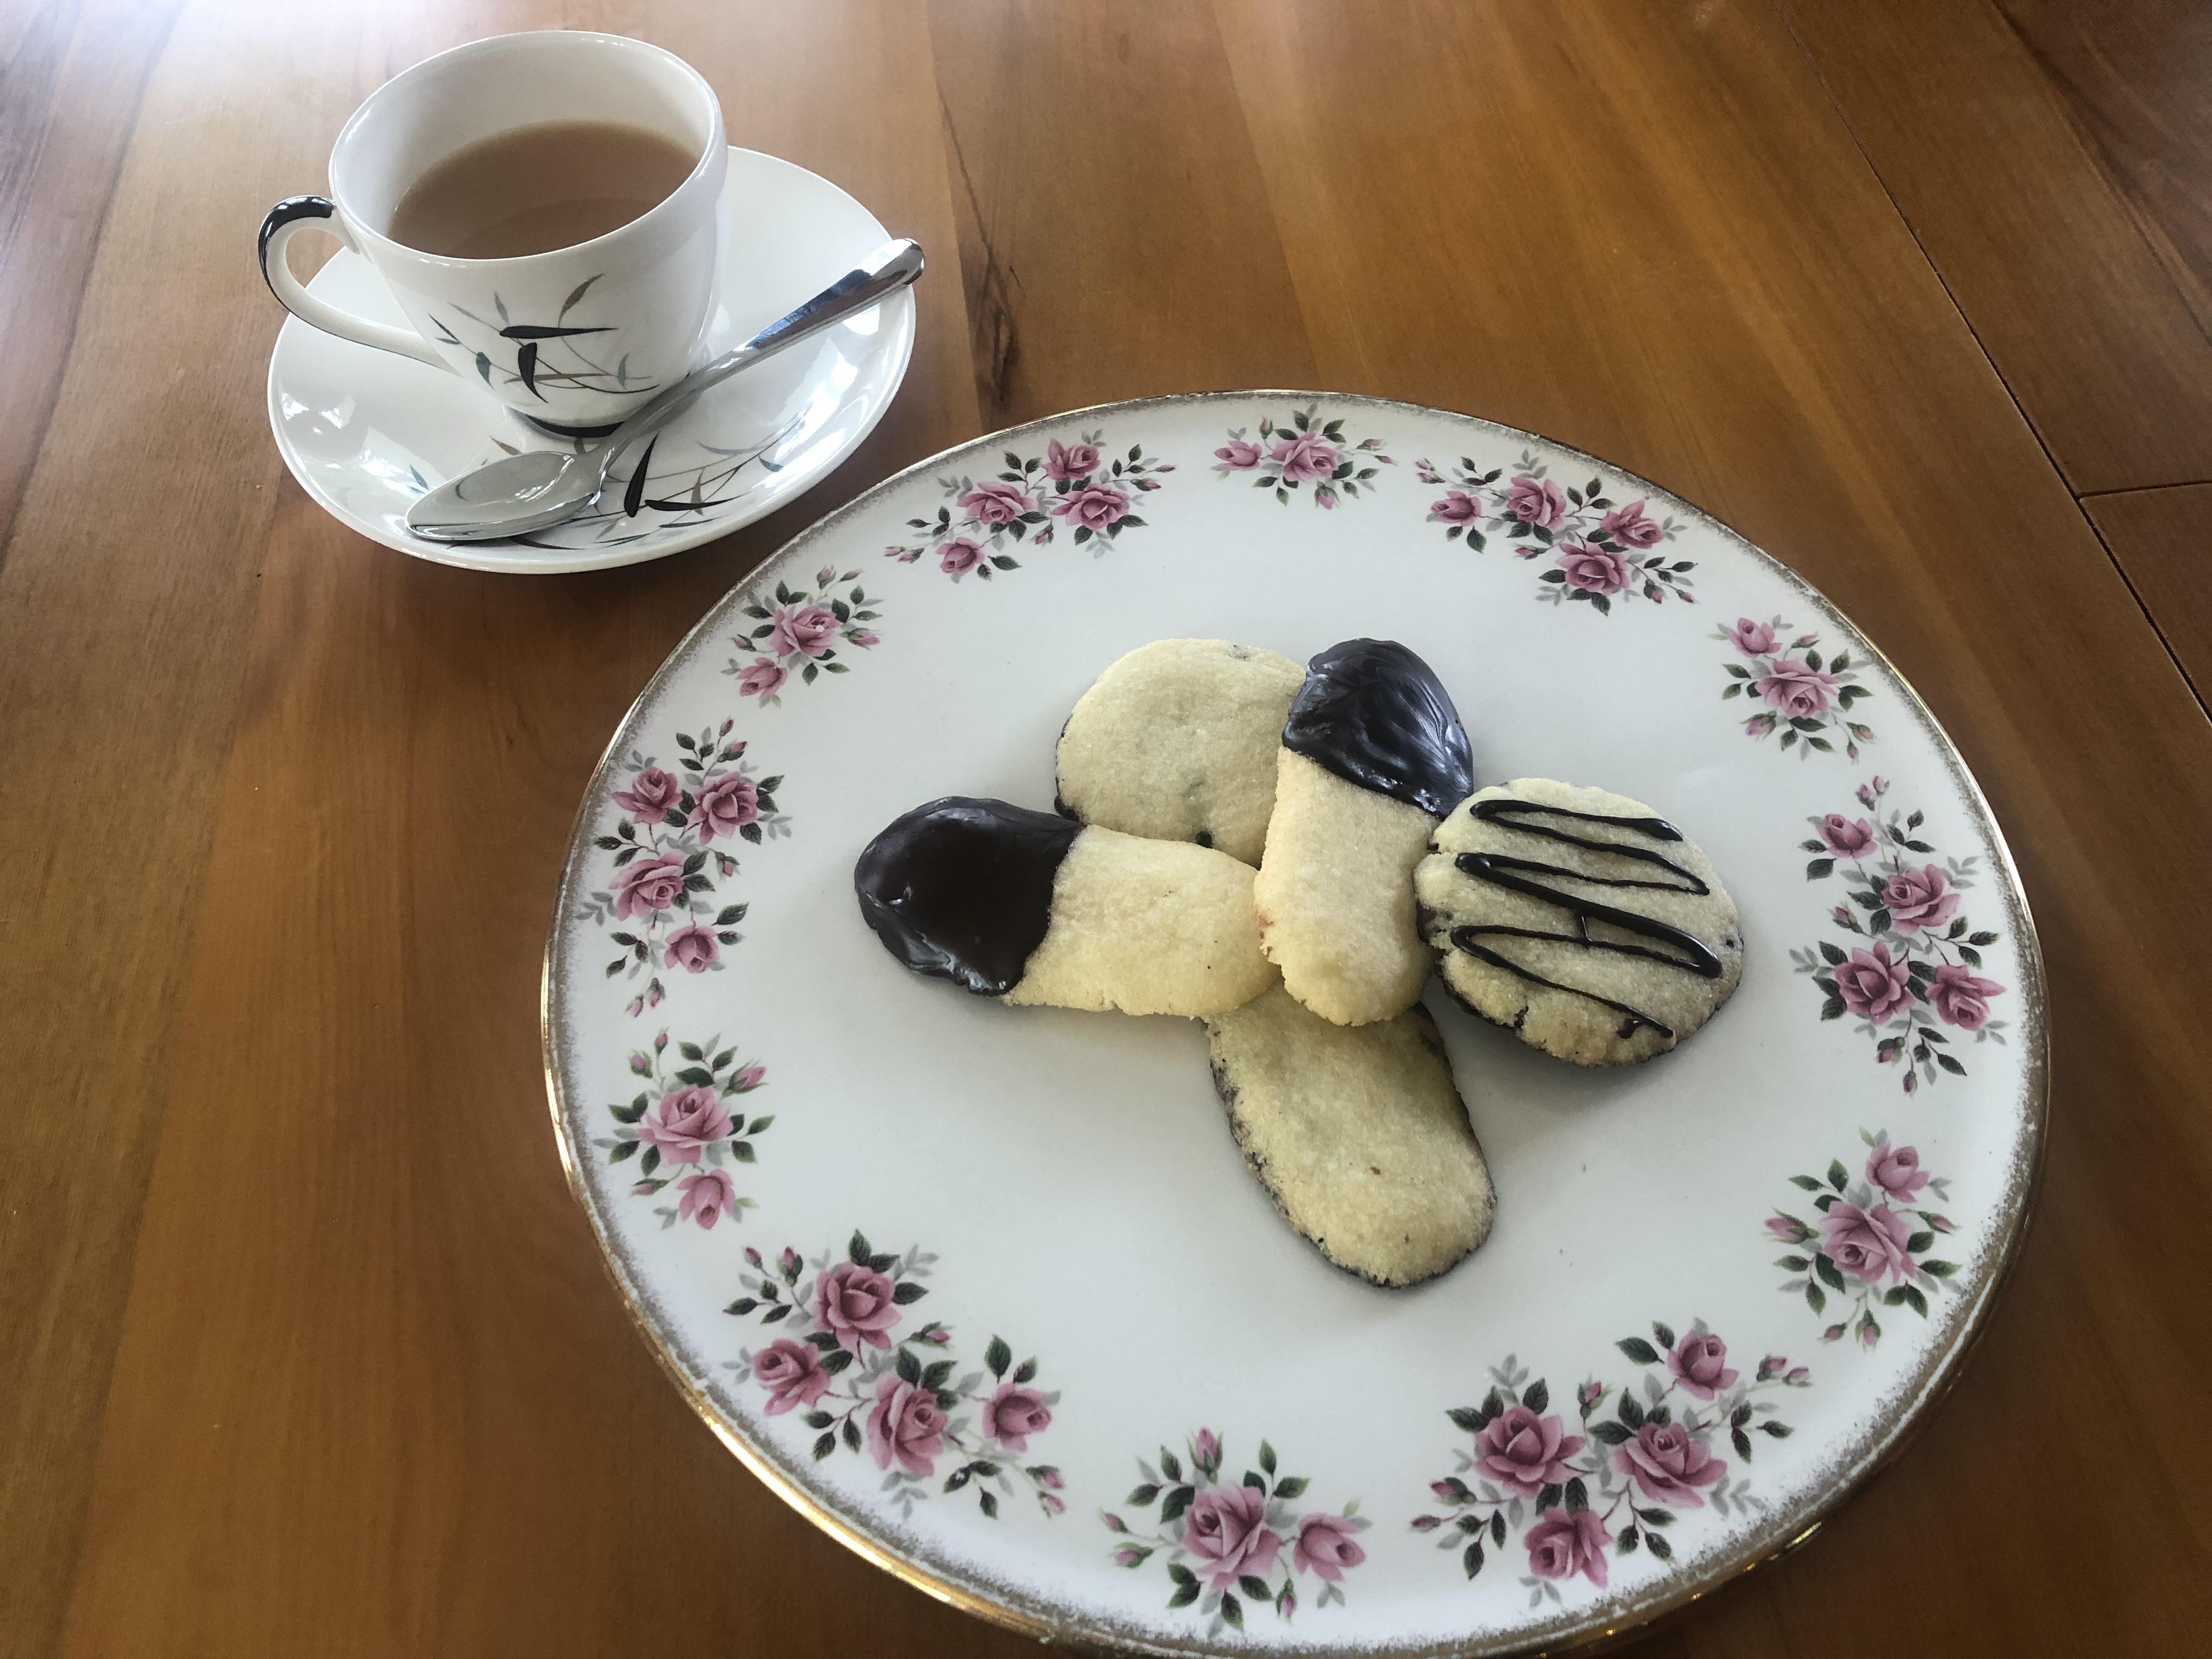 Peppermint Crisp Cookies